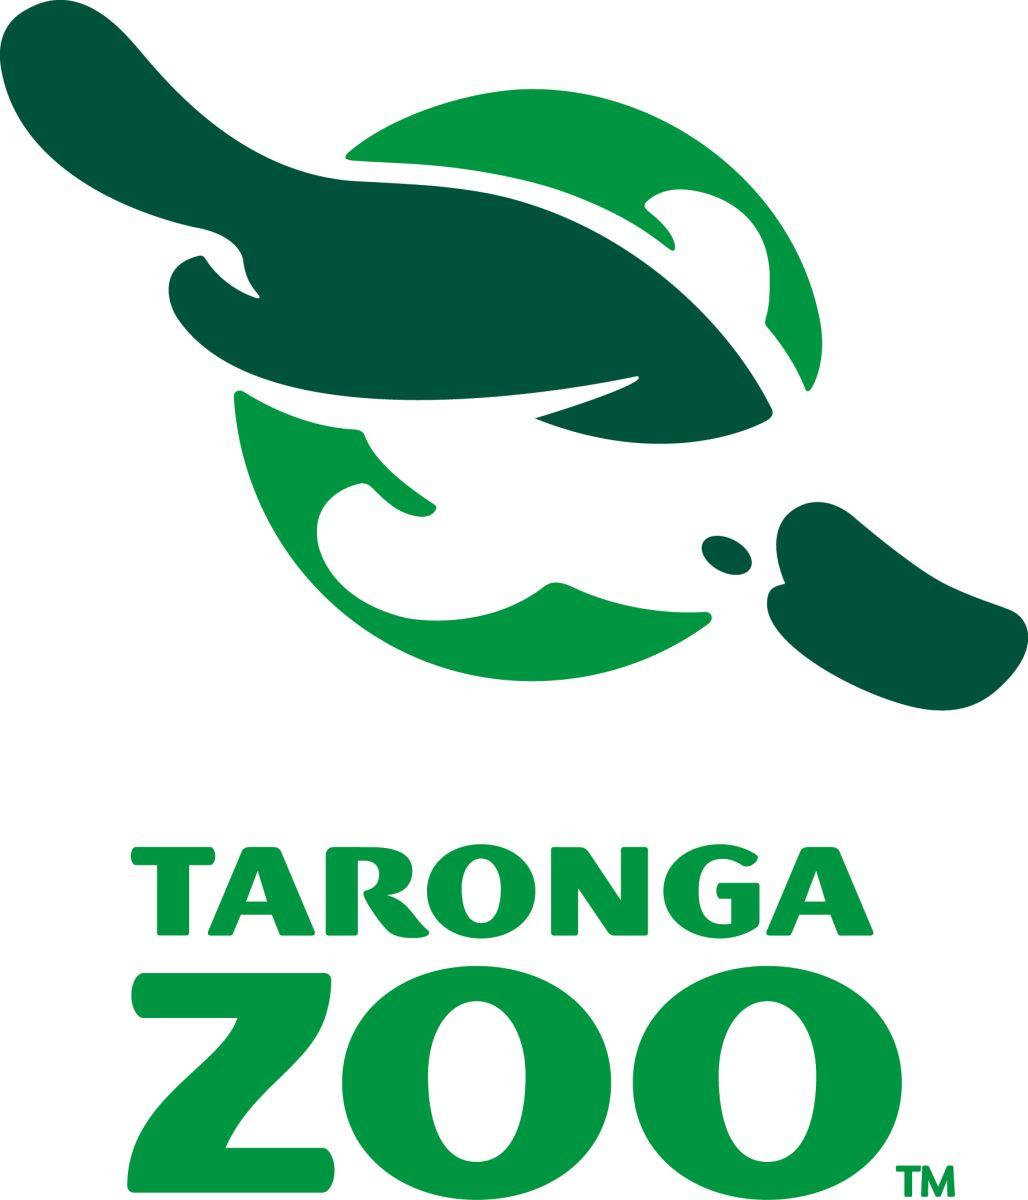 Taronga Zoo logo.jpg